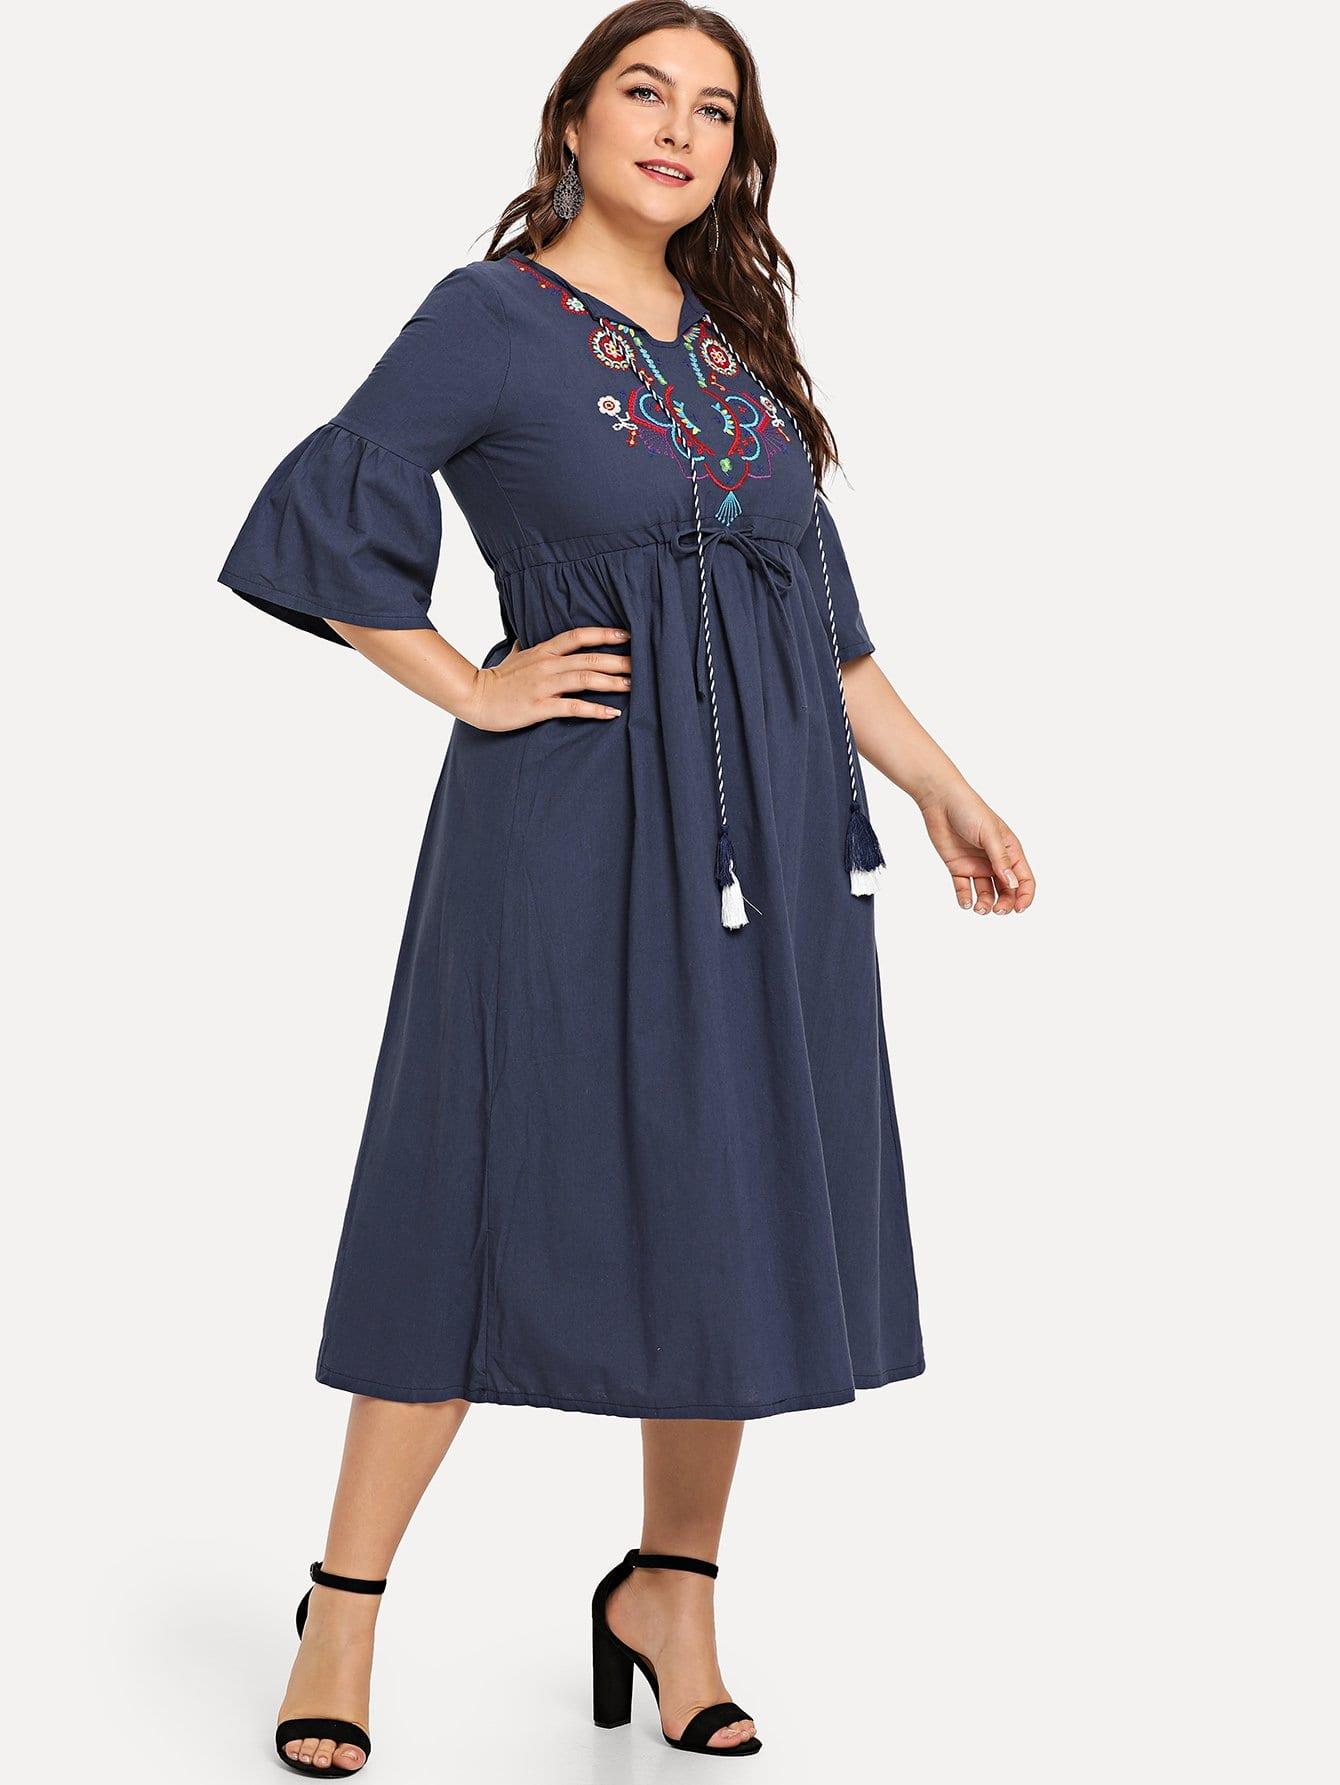 Plus Fringe Tie Neck Geo Embroidered Dress